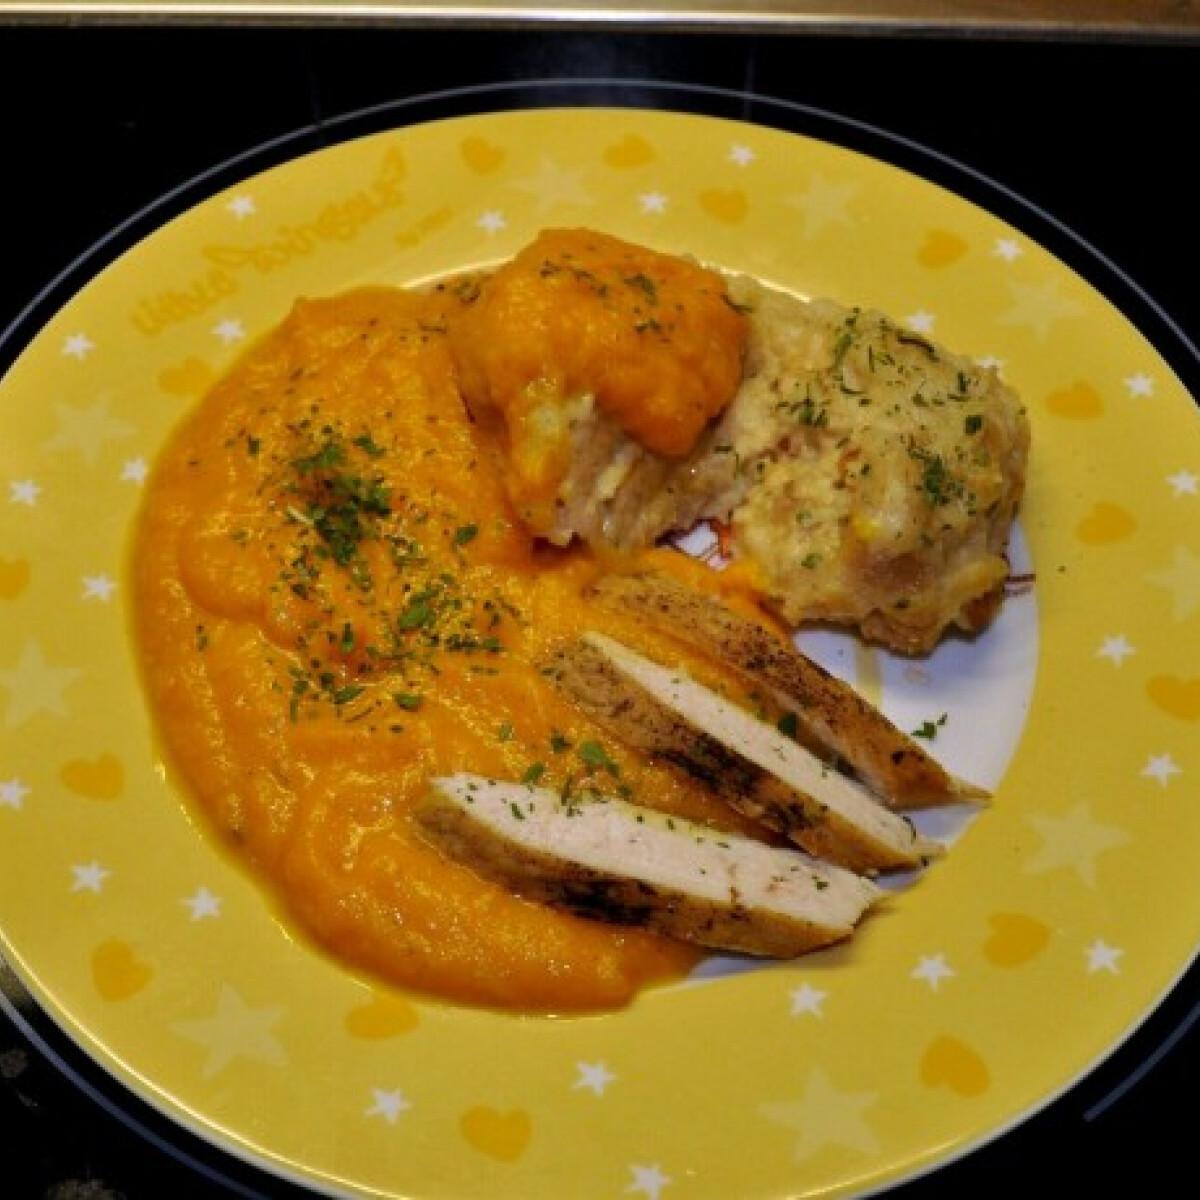 Vadas-csirke zsemlegombóccal